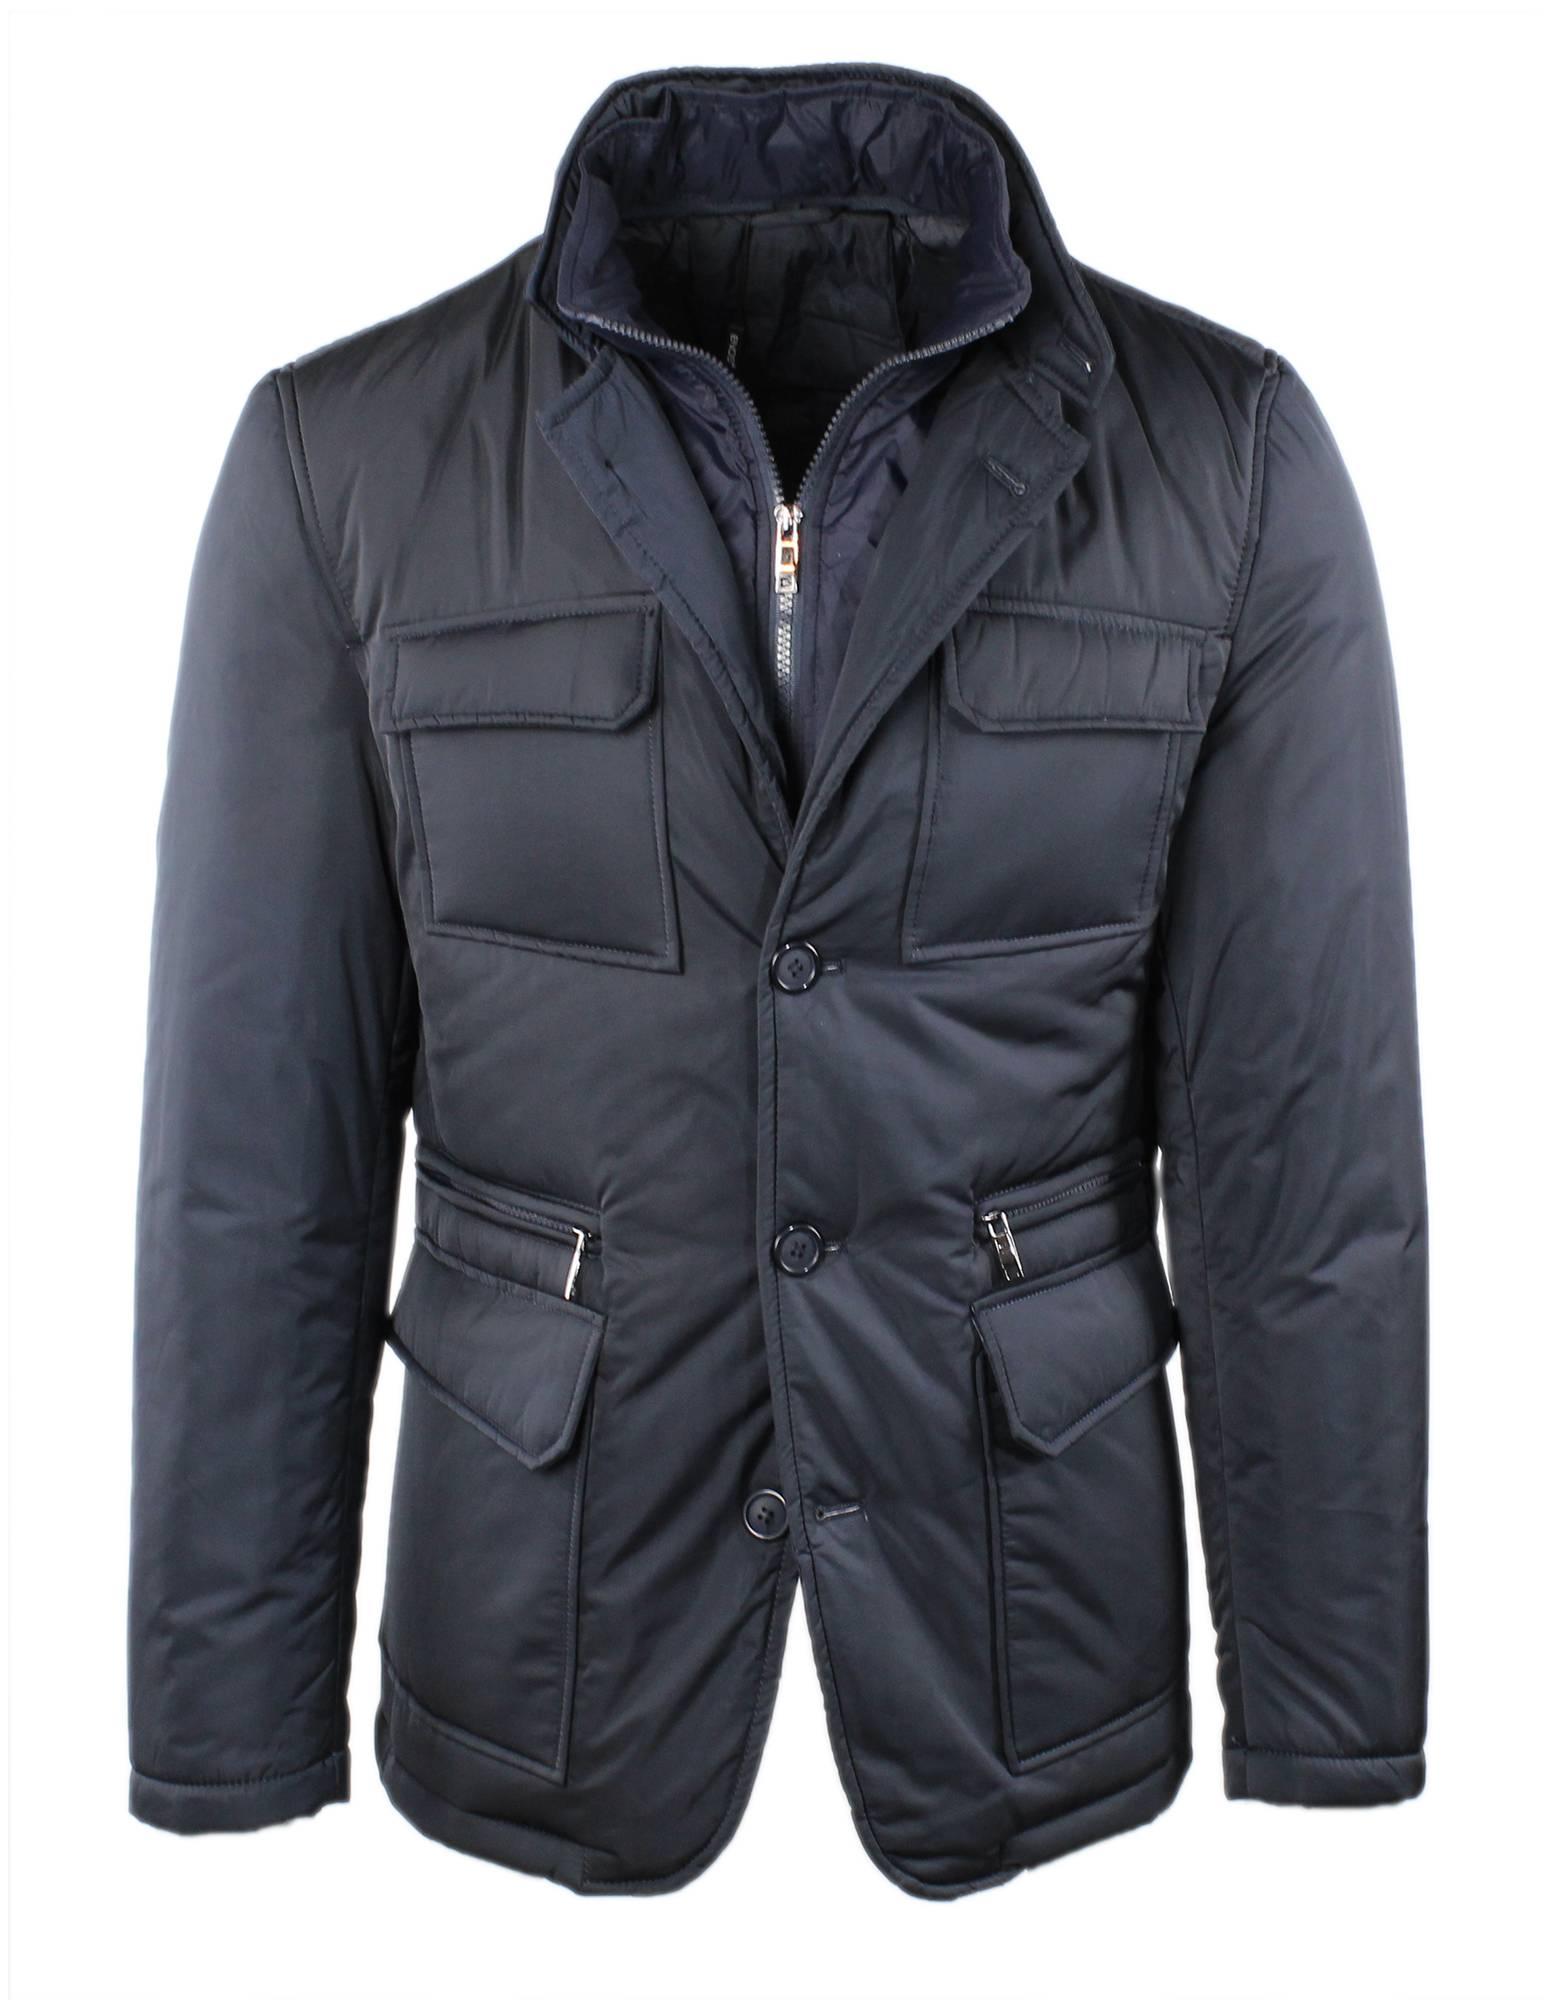 Giubbotto-Uomo-Invernale-Elegante-Slim-Fit-Giacca-Giubbino-Sartoriale-Blu-Nero miniatura 4